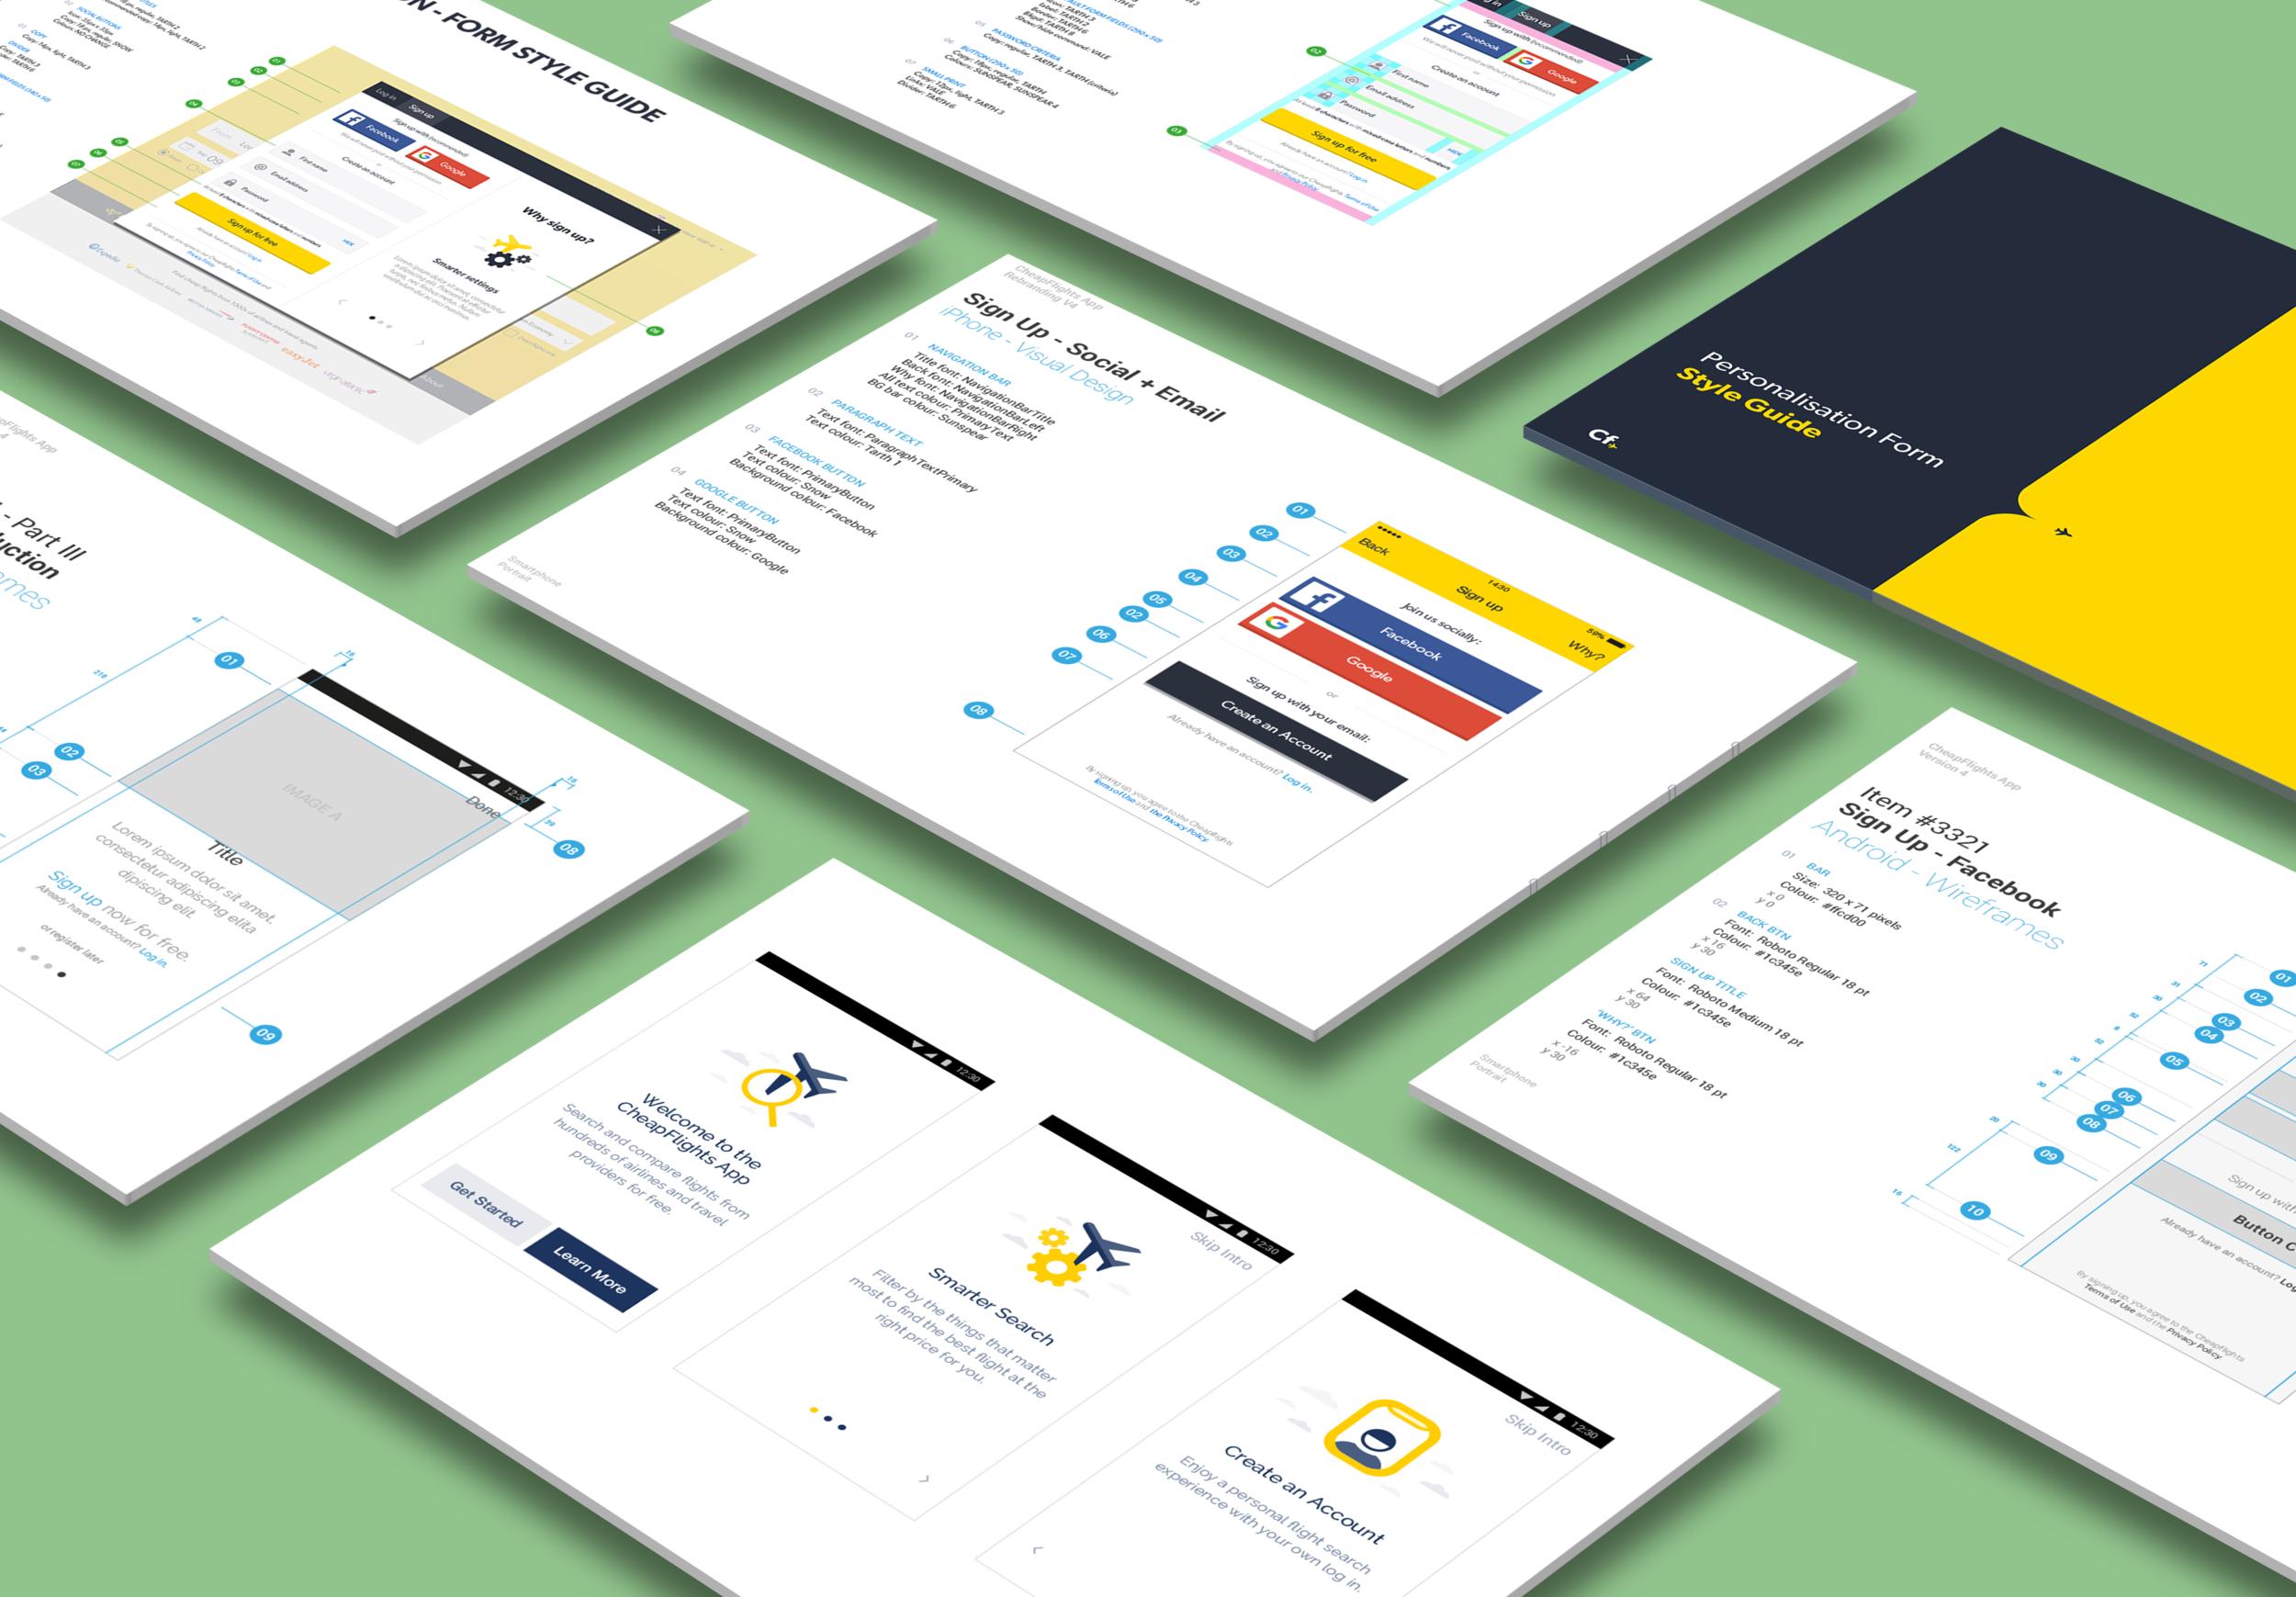 Rebranded app and web form guidelines (including UI design and app walkthrough)